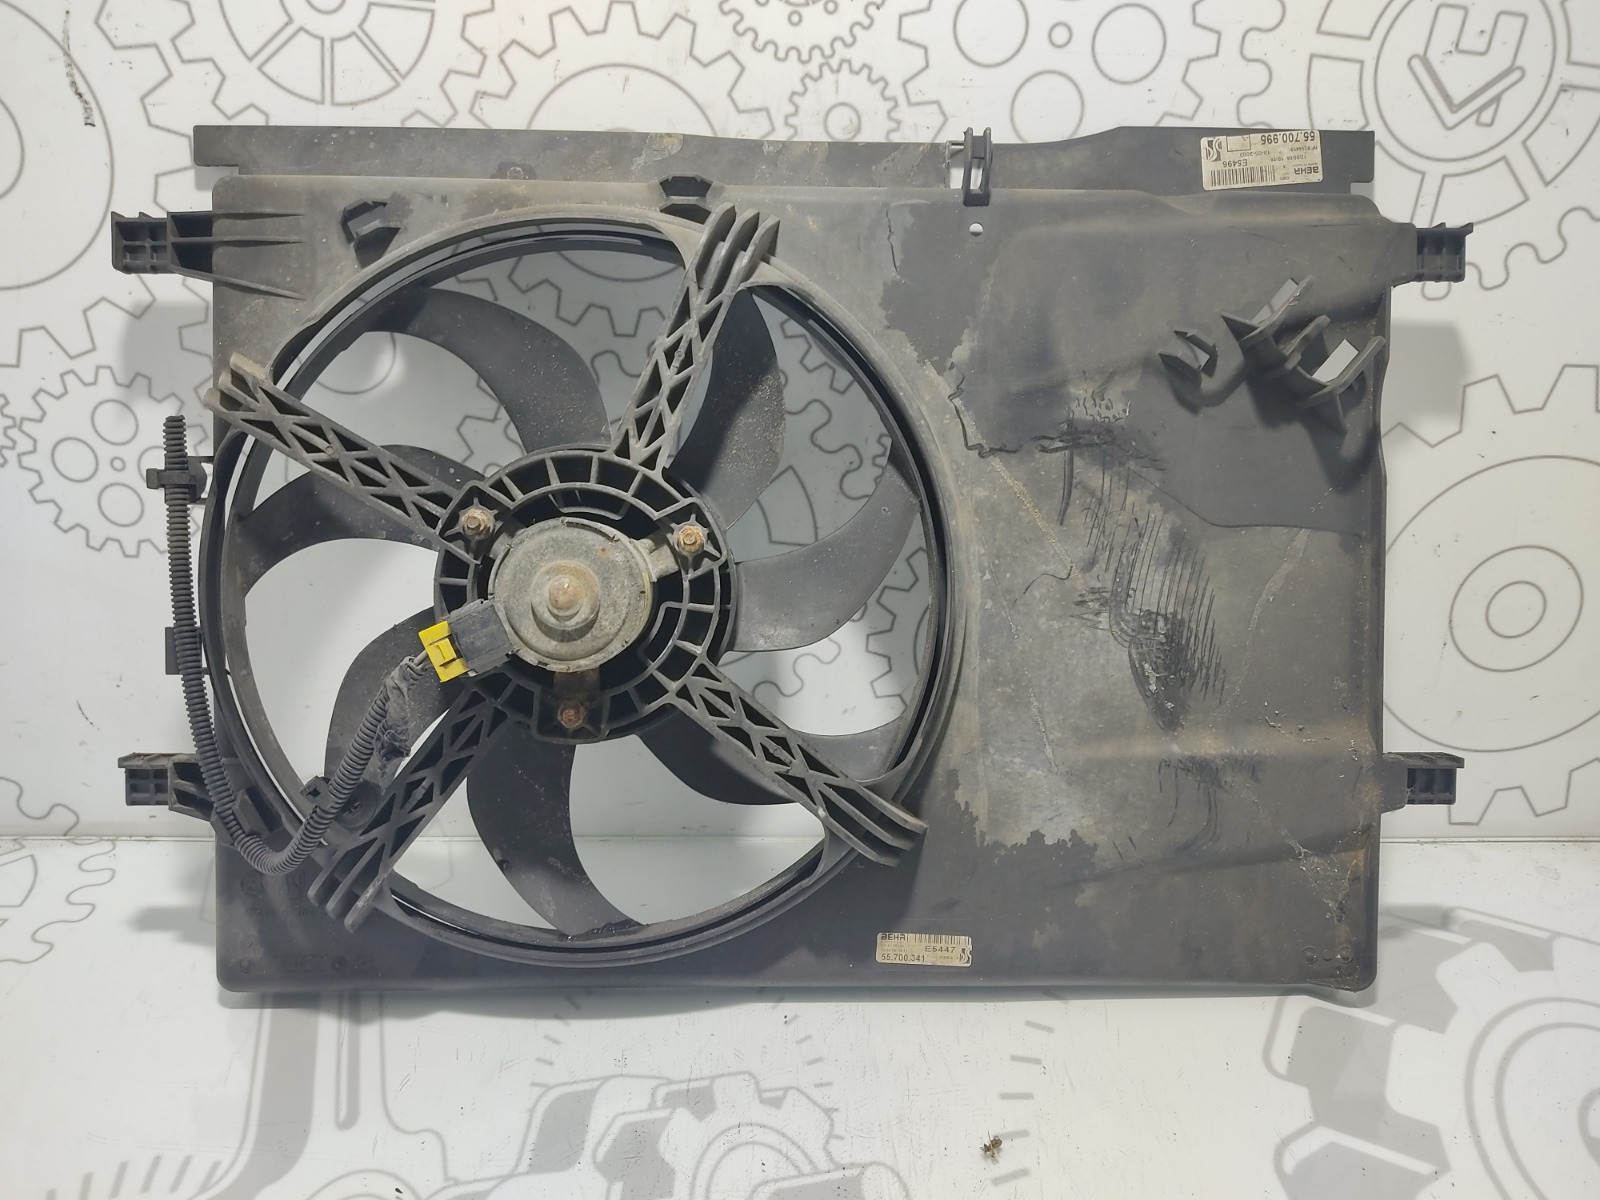 Вентилятор радиатора Fiat Grande Punto 1.4 I 2007 (б/у)